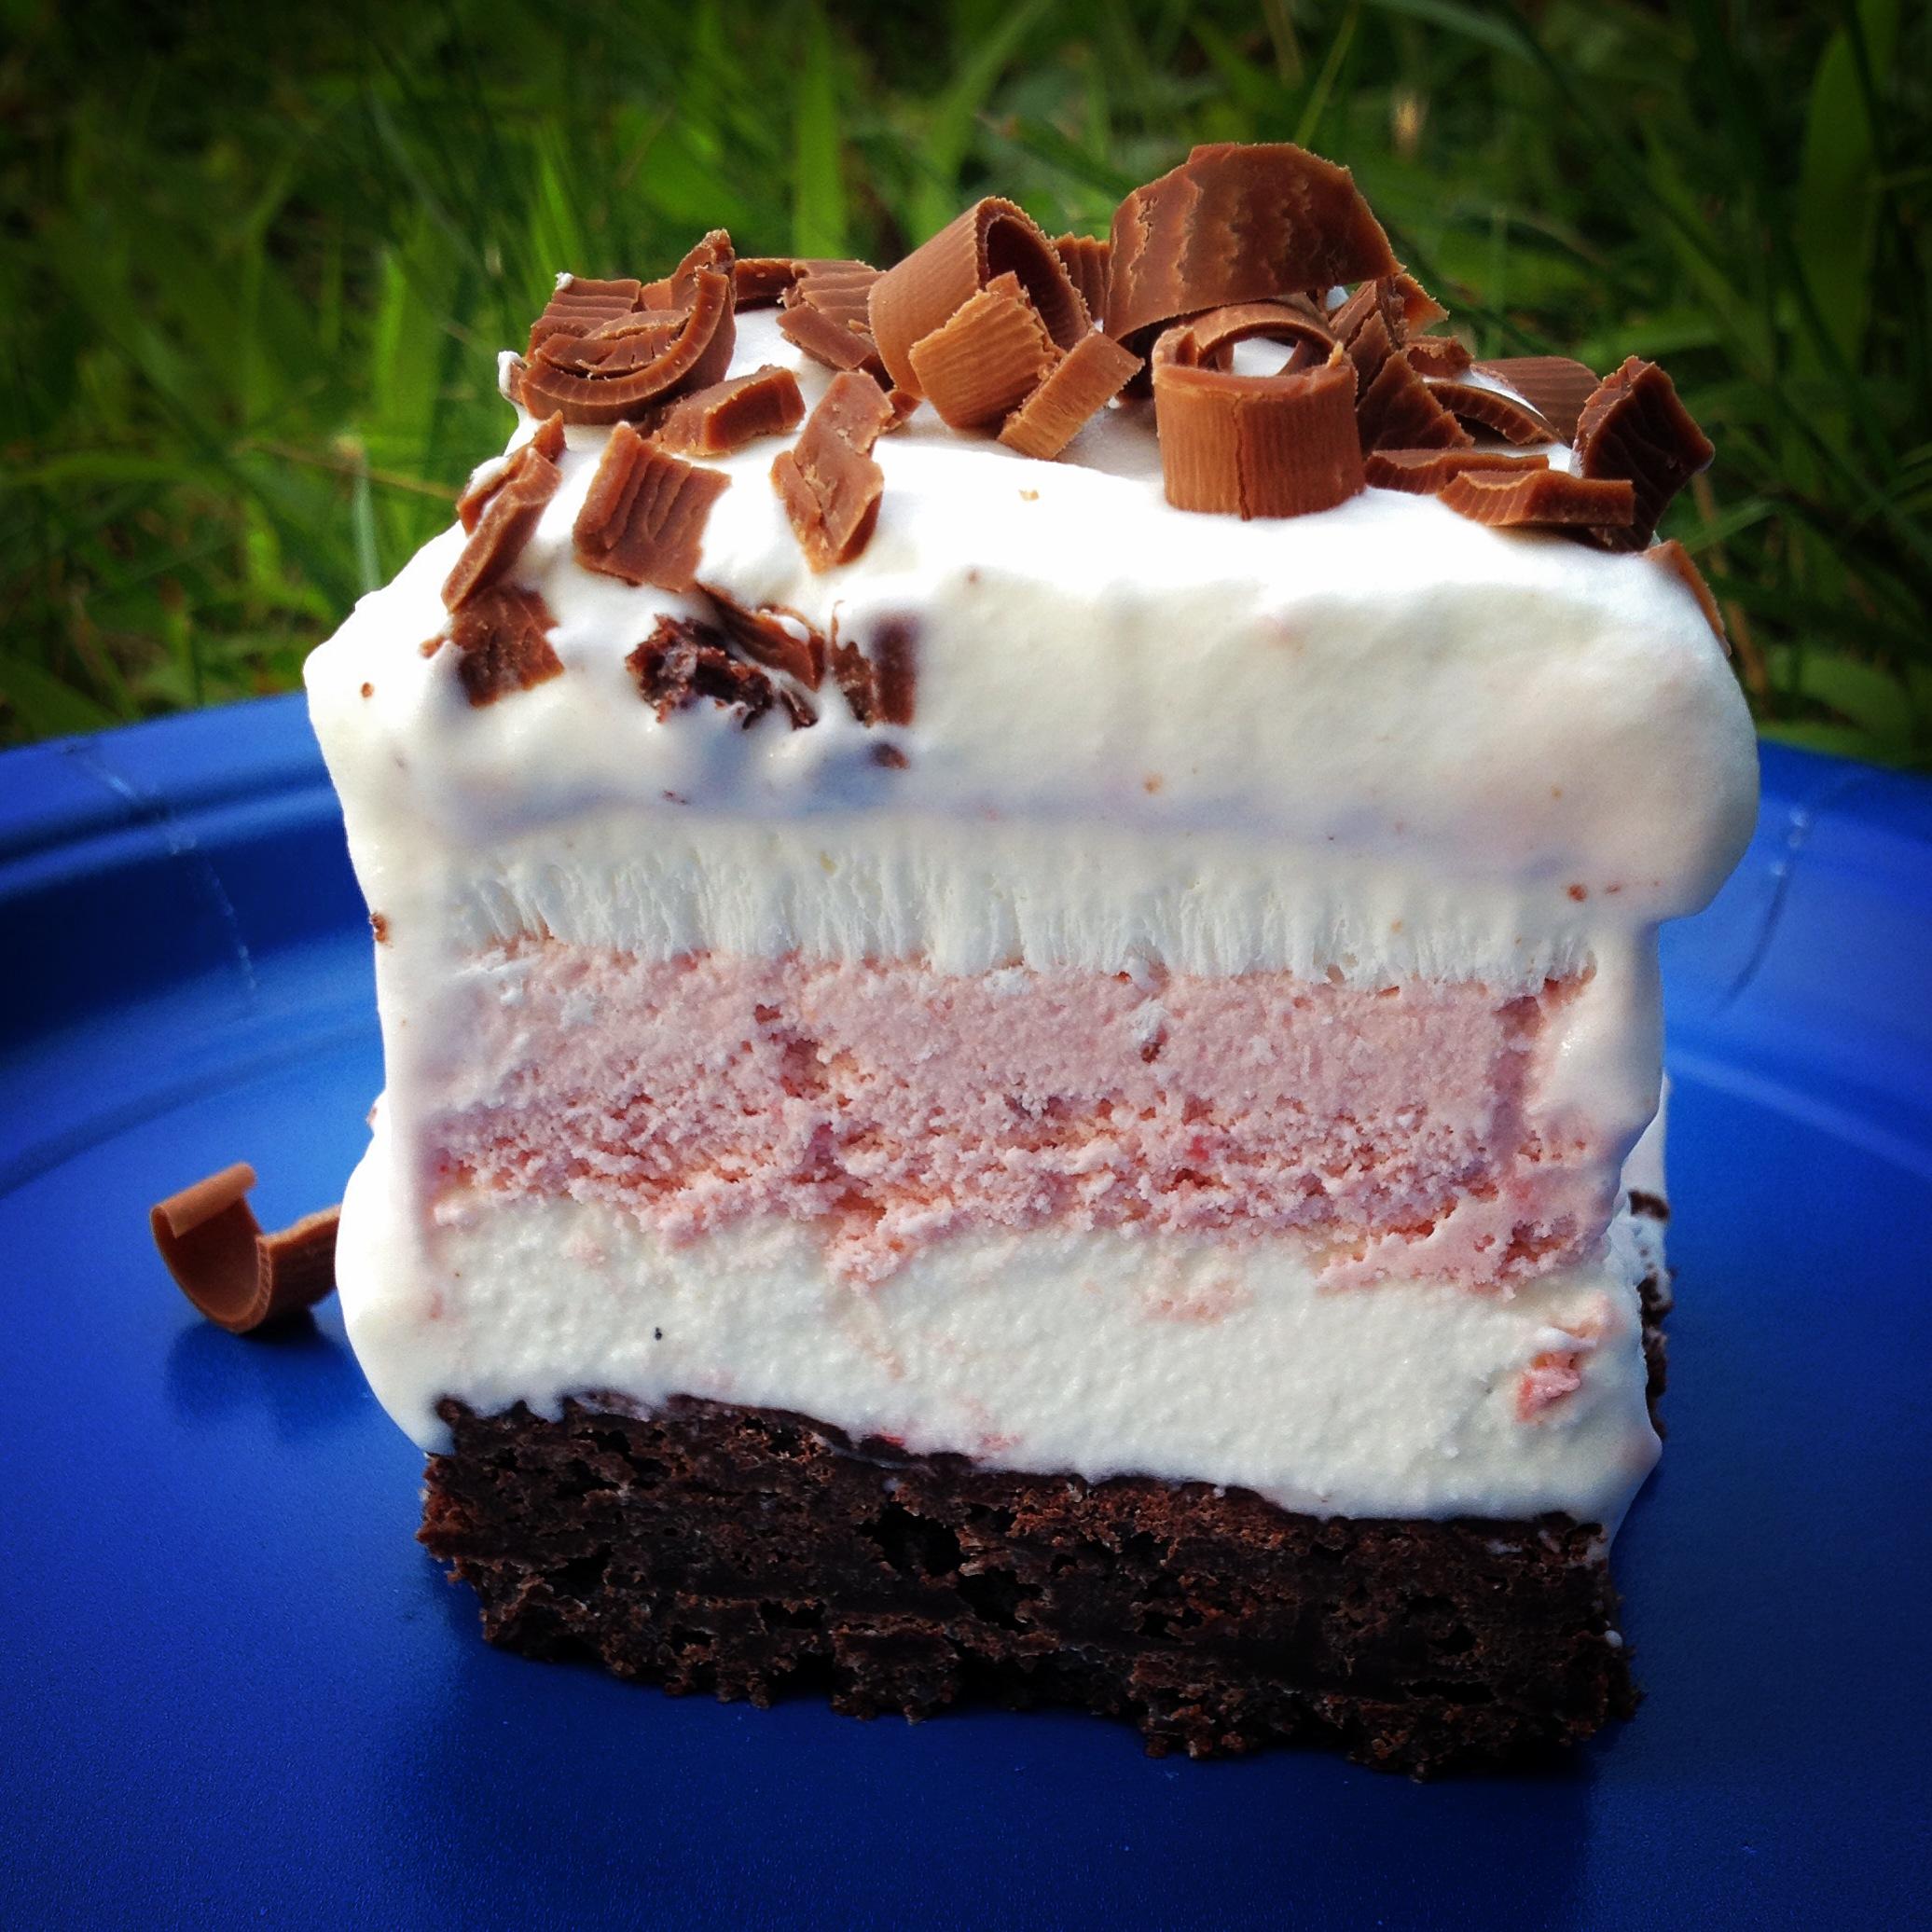 ice cream cake: balsamic roasted strawberry ice cream vanilla bean ice cream sourdough brownie crust whipped cream topping with milk chocolate curls